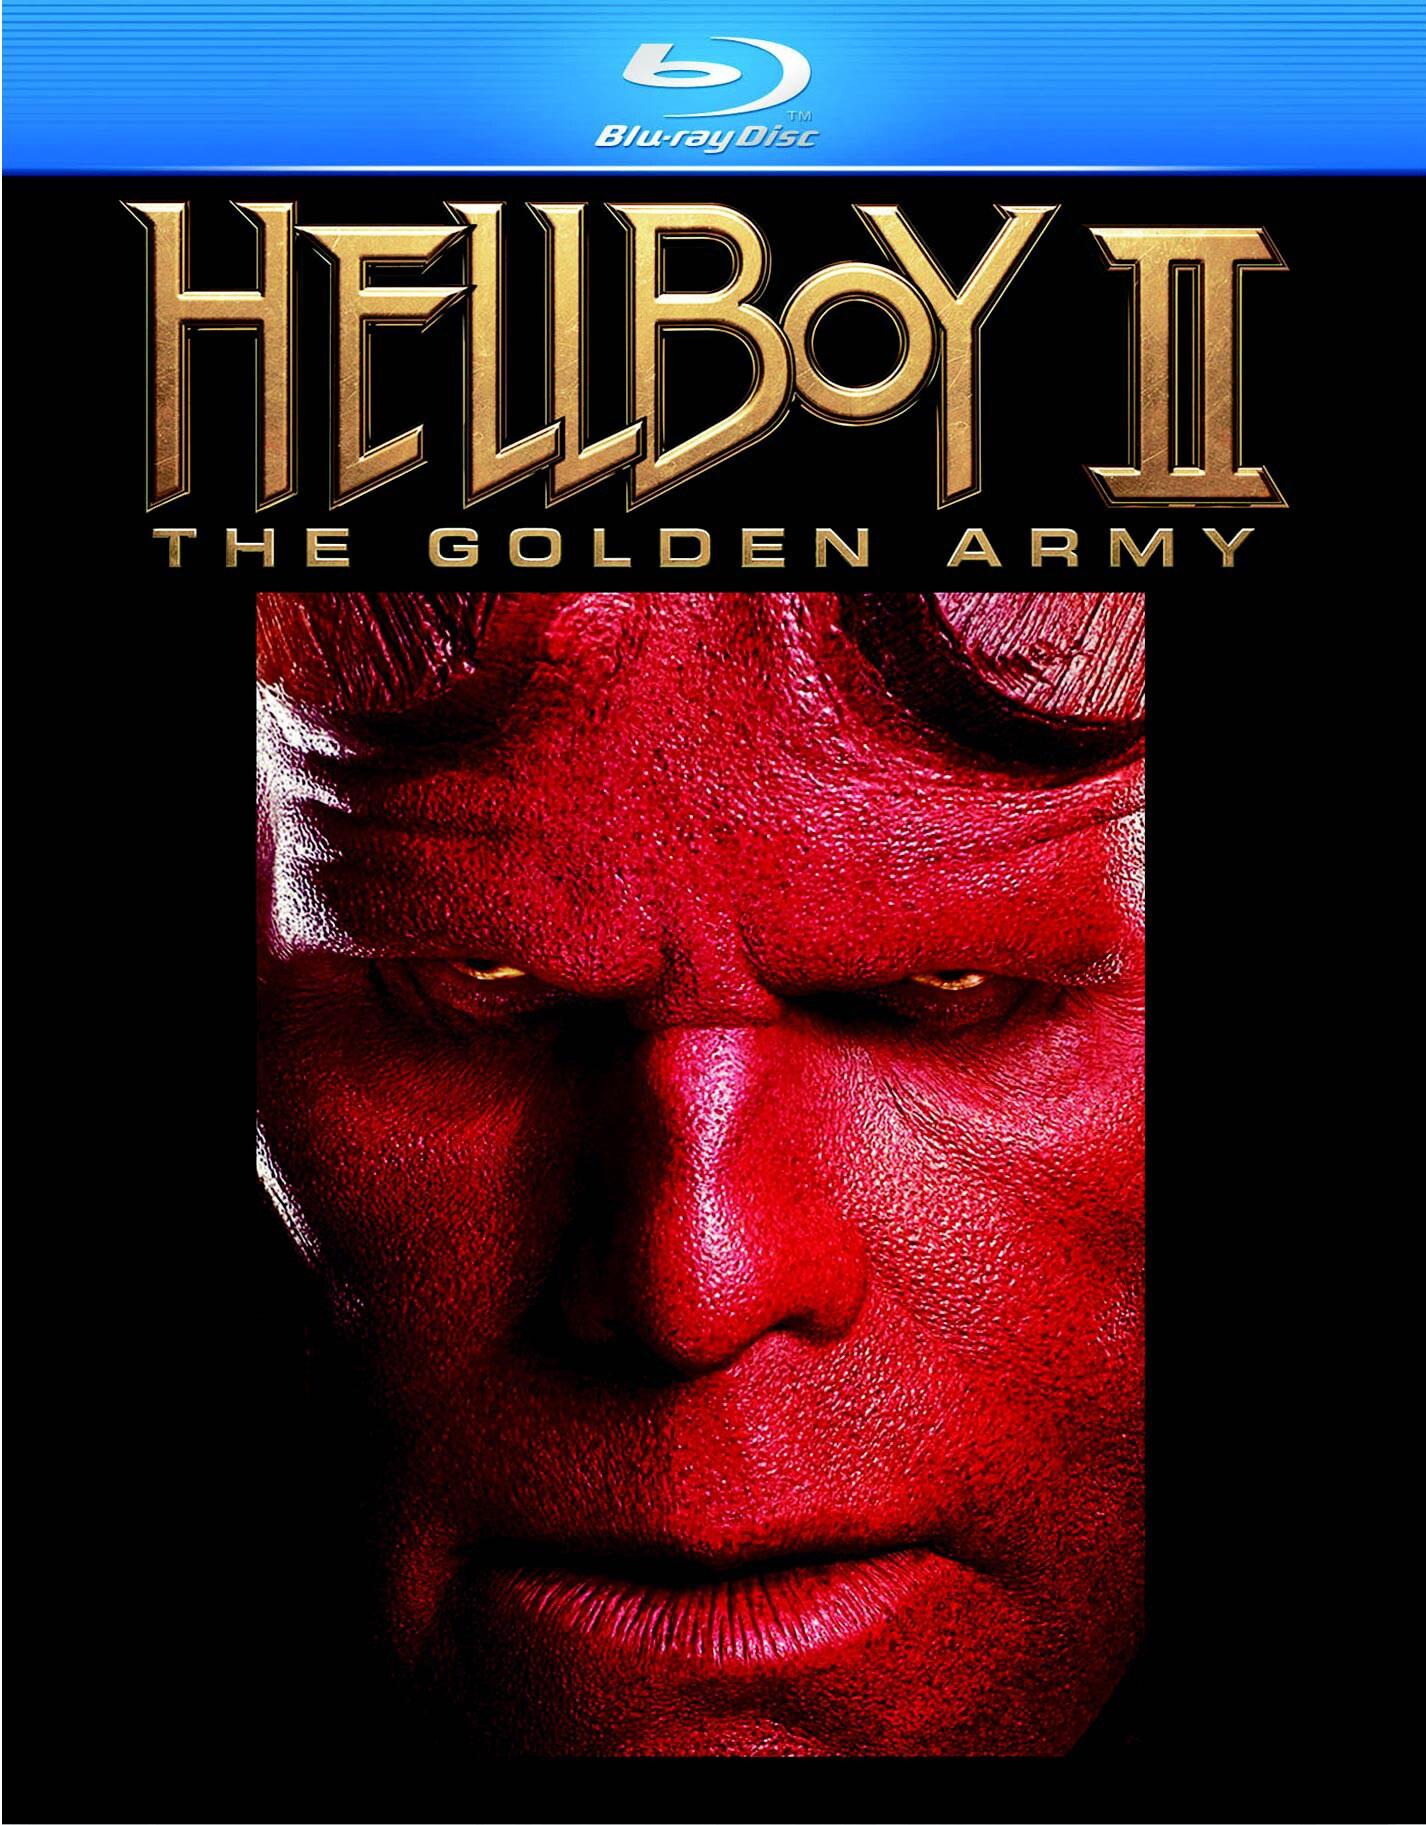 Hellboy II: The Golden Army (Blu-ray Disc)